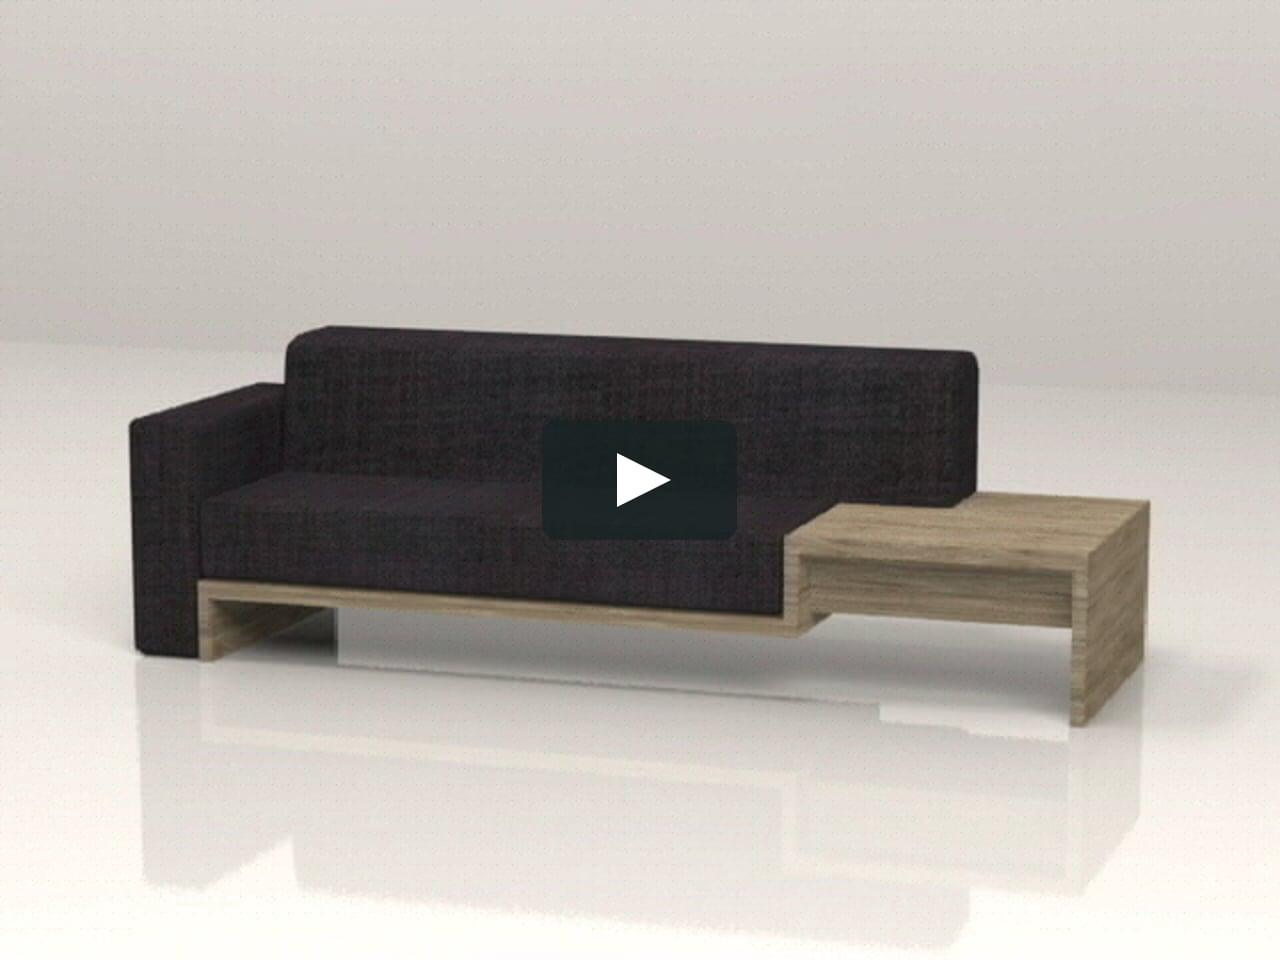 Furniture Turntable By Valencia Gunawan On Vimeo